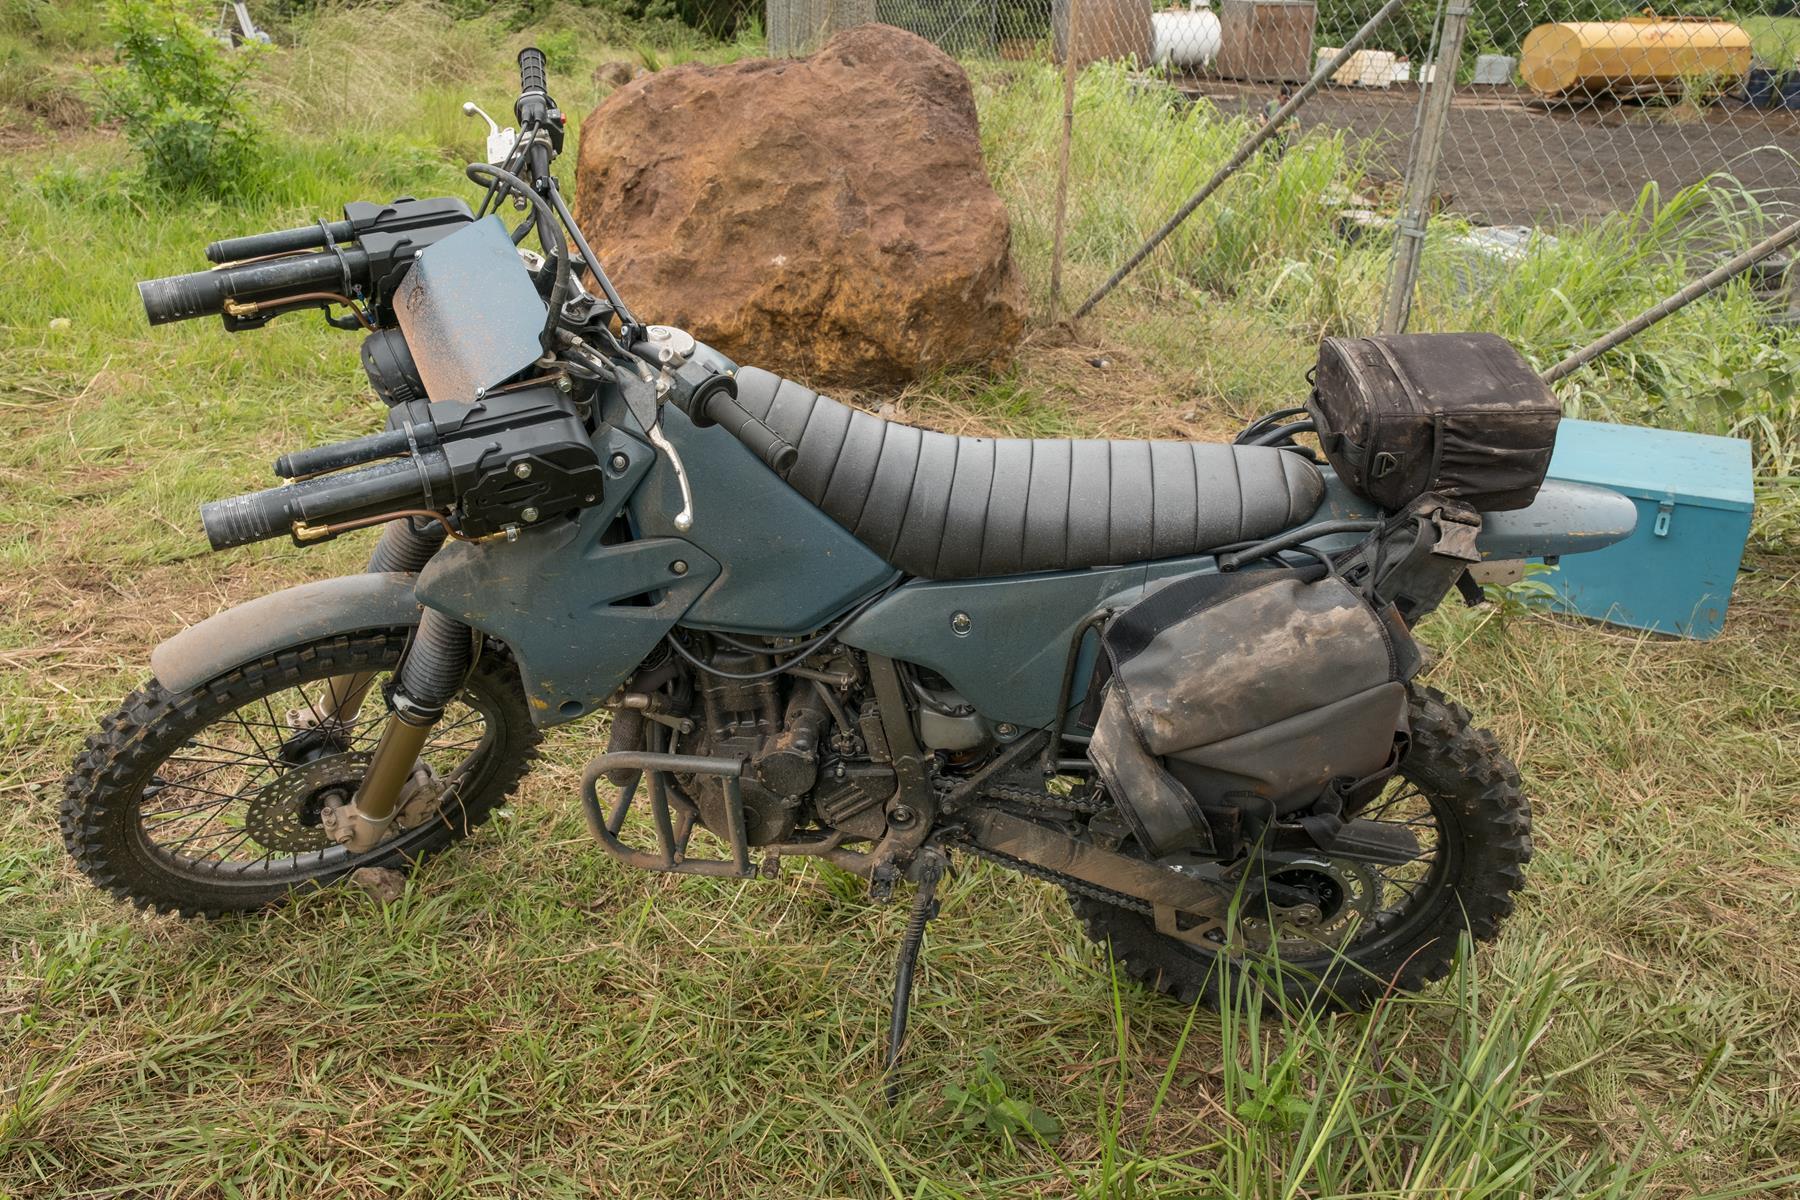 Jumanji Motorcycle